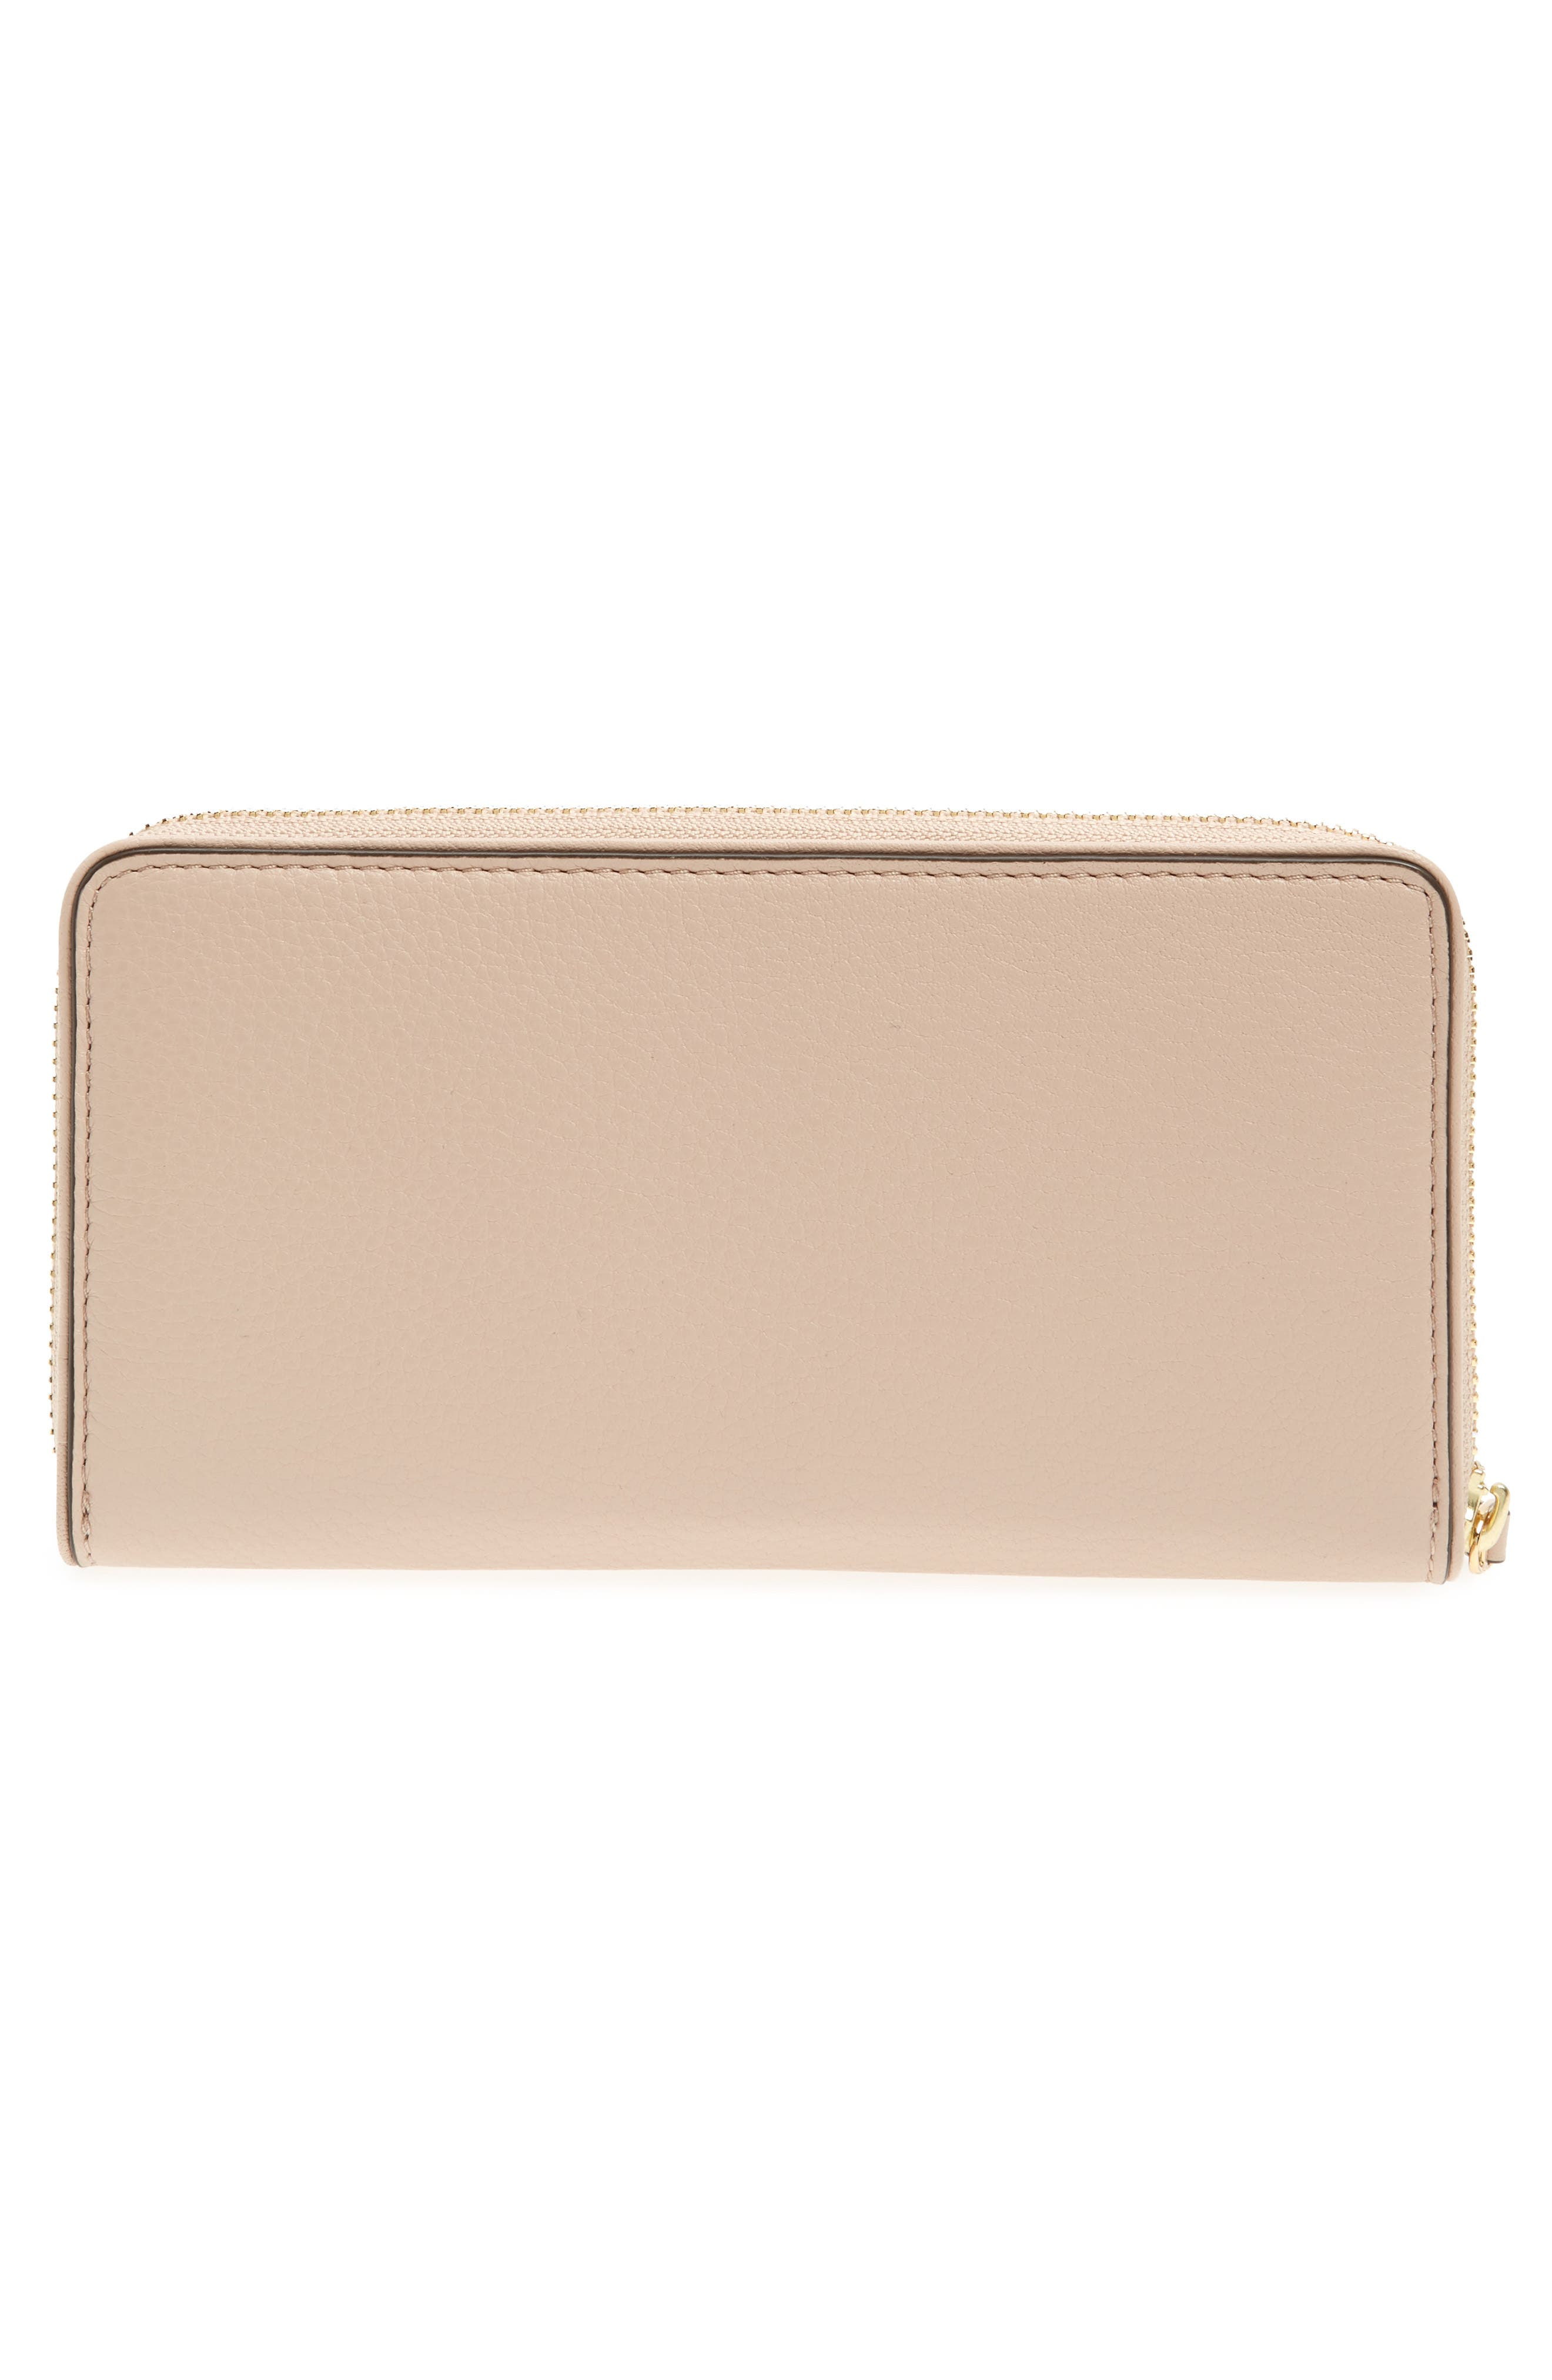 Marsden Leather Zip Around Wallet,                             Alternate thumbnail 9, color,